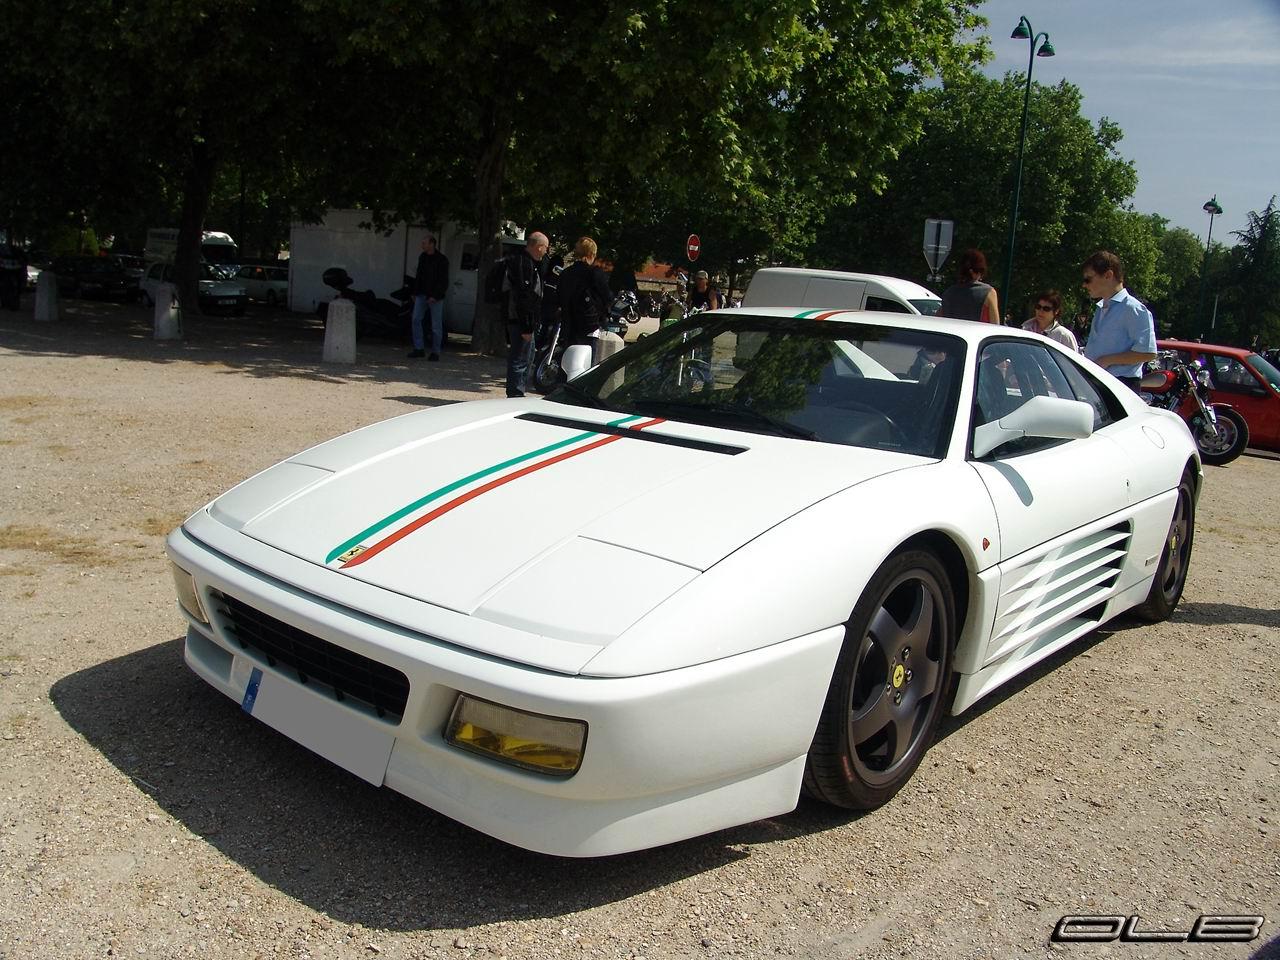 http://images.caradisiac.com/images/6/9/5/5/16955/S0-Photo-du-jour-Ferrari-348-Challenge-74424.jpg